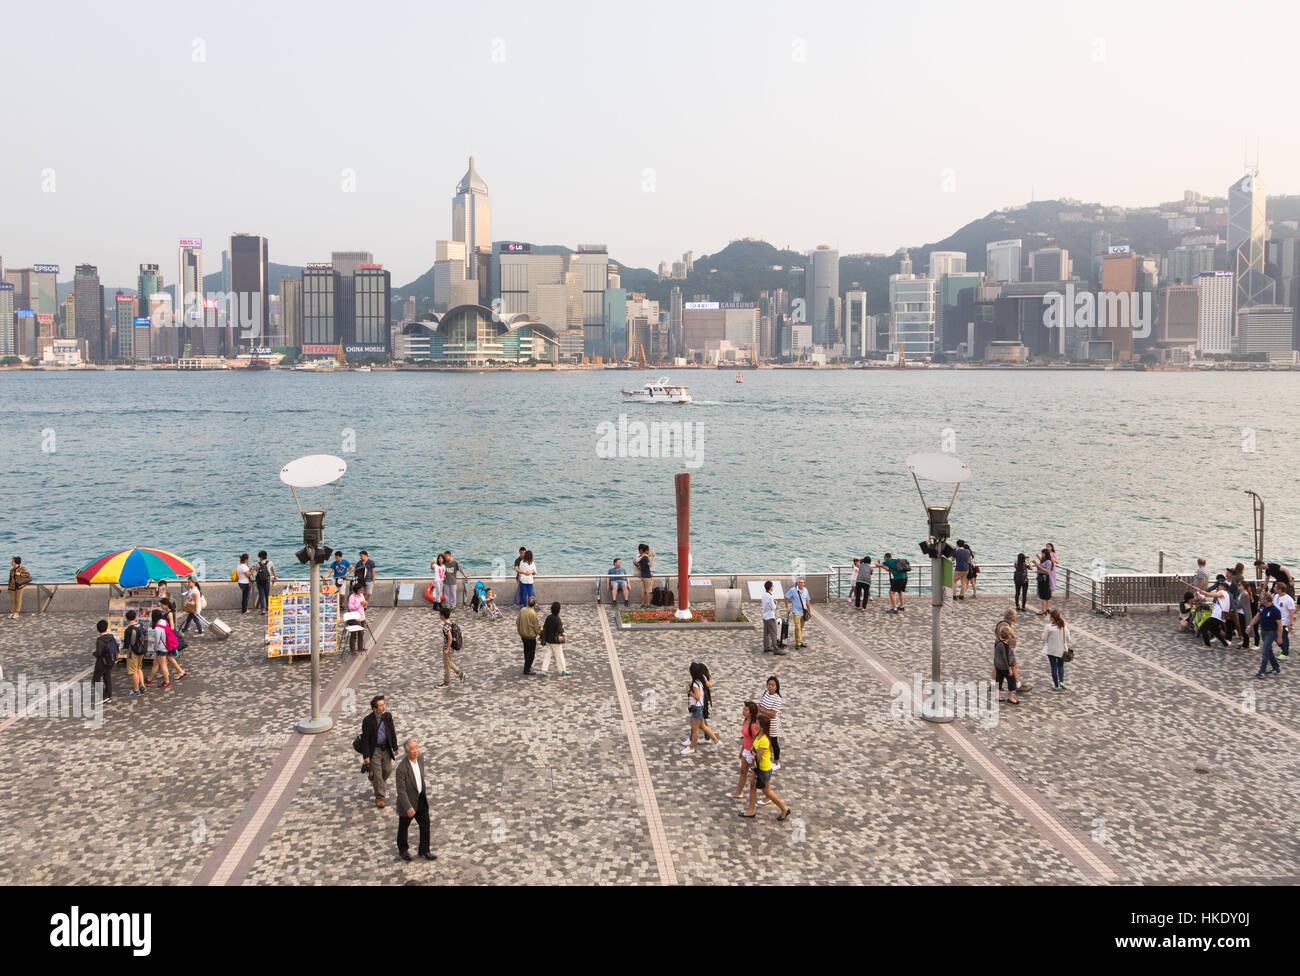 Hong Kong, Hong Kong - April 26 2015: Tourists take pictures and enjoy the famous Hong Kong island skyline across - Stock Image